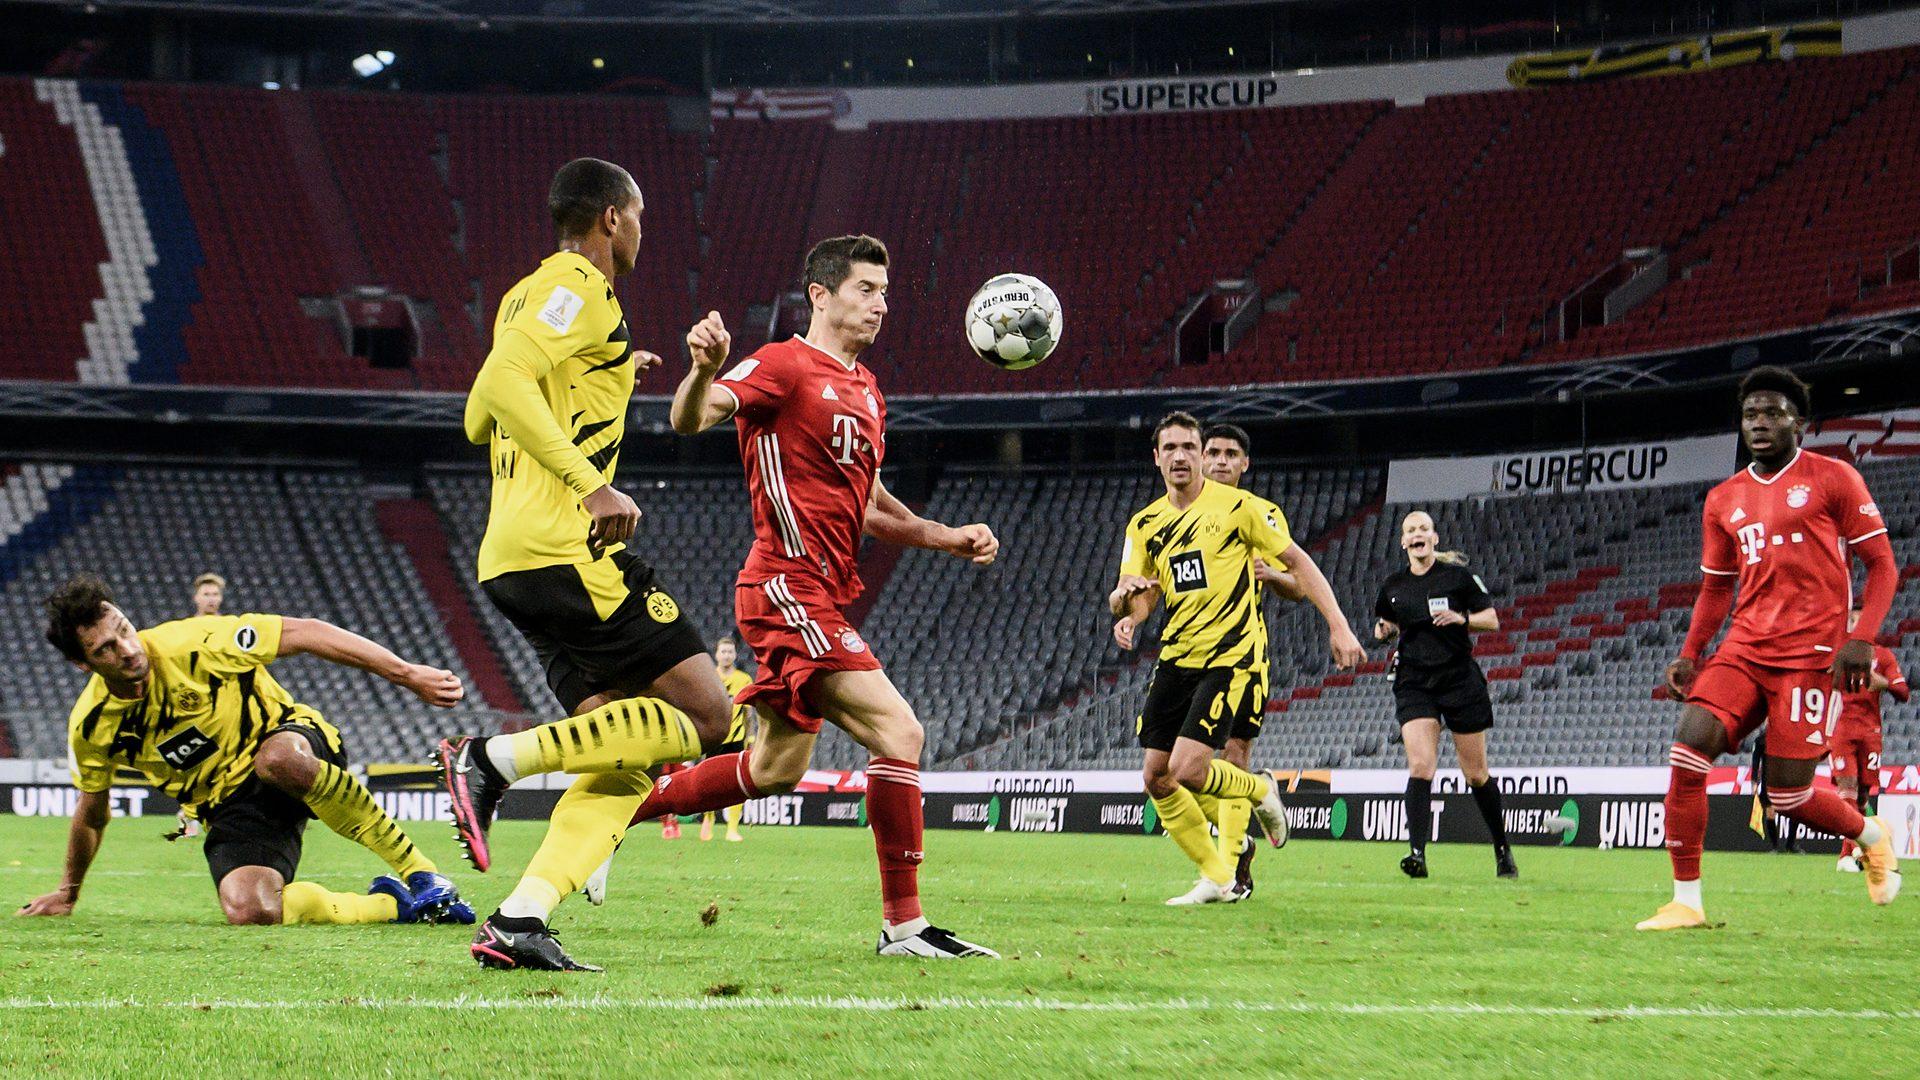 Bundesliga Borussia Dortmund Vs Bayern Munich The Top 5 Matches In Der Klassiker History